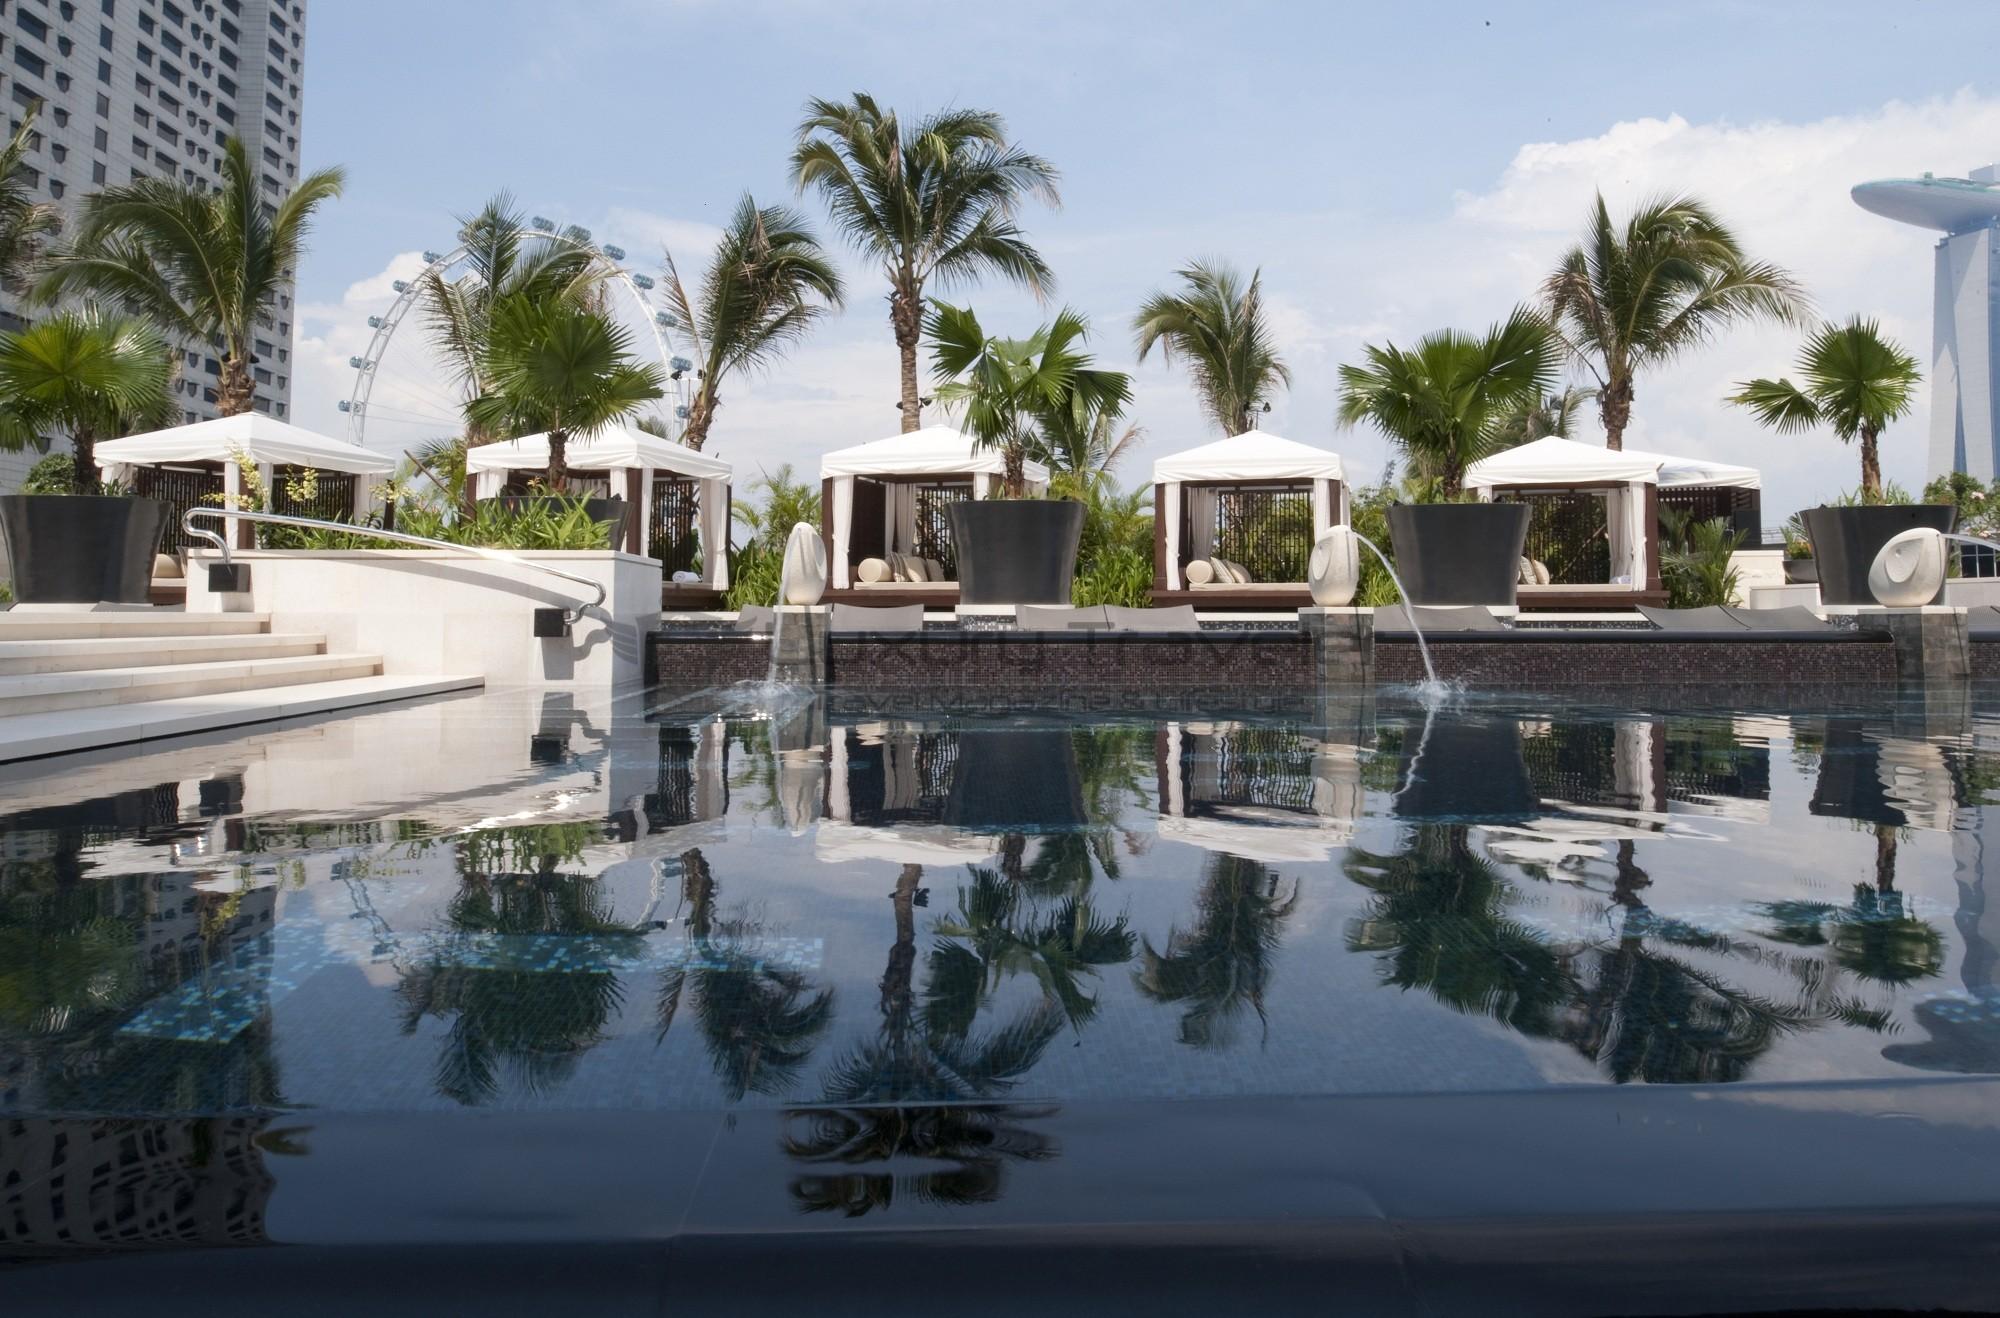 Mandarin_Oriental_Singapore_Hotel_Exterior_Pool